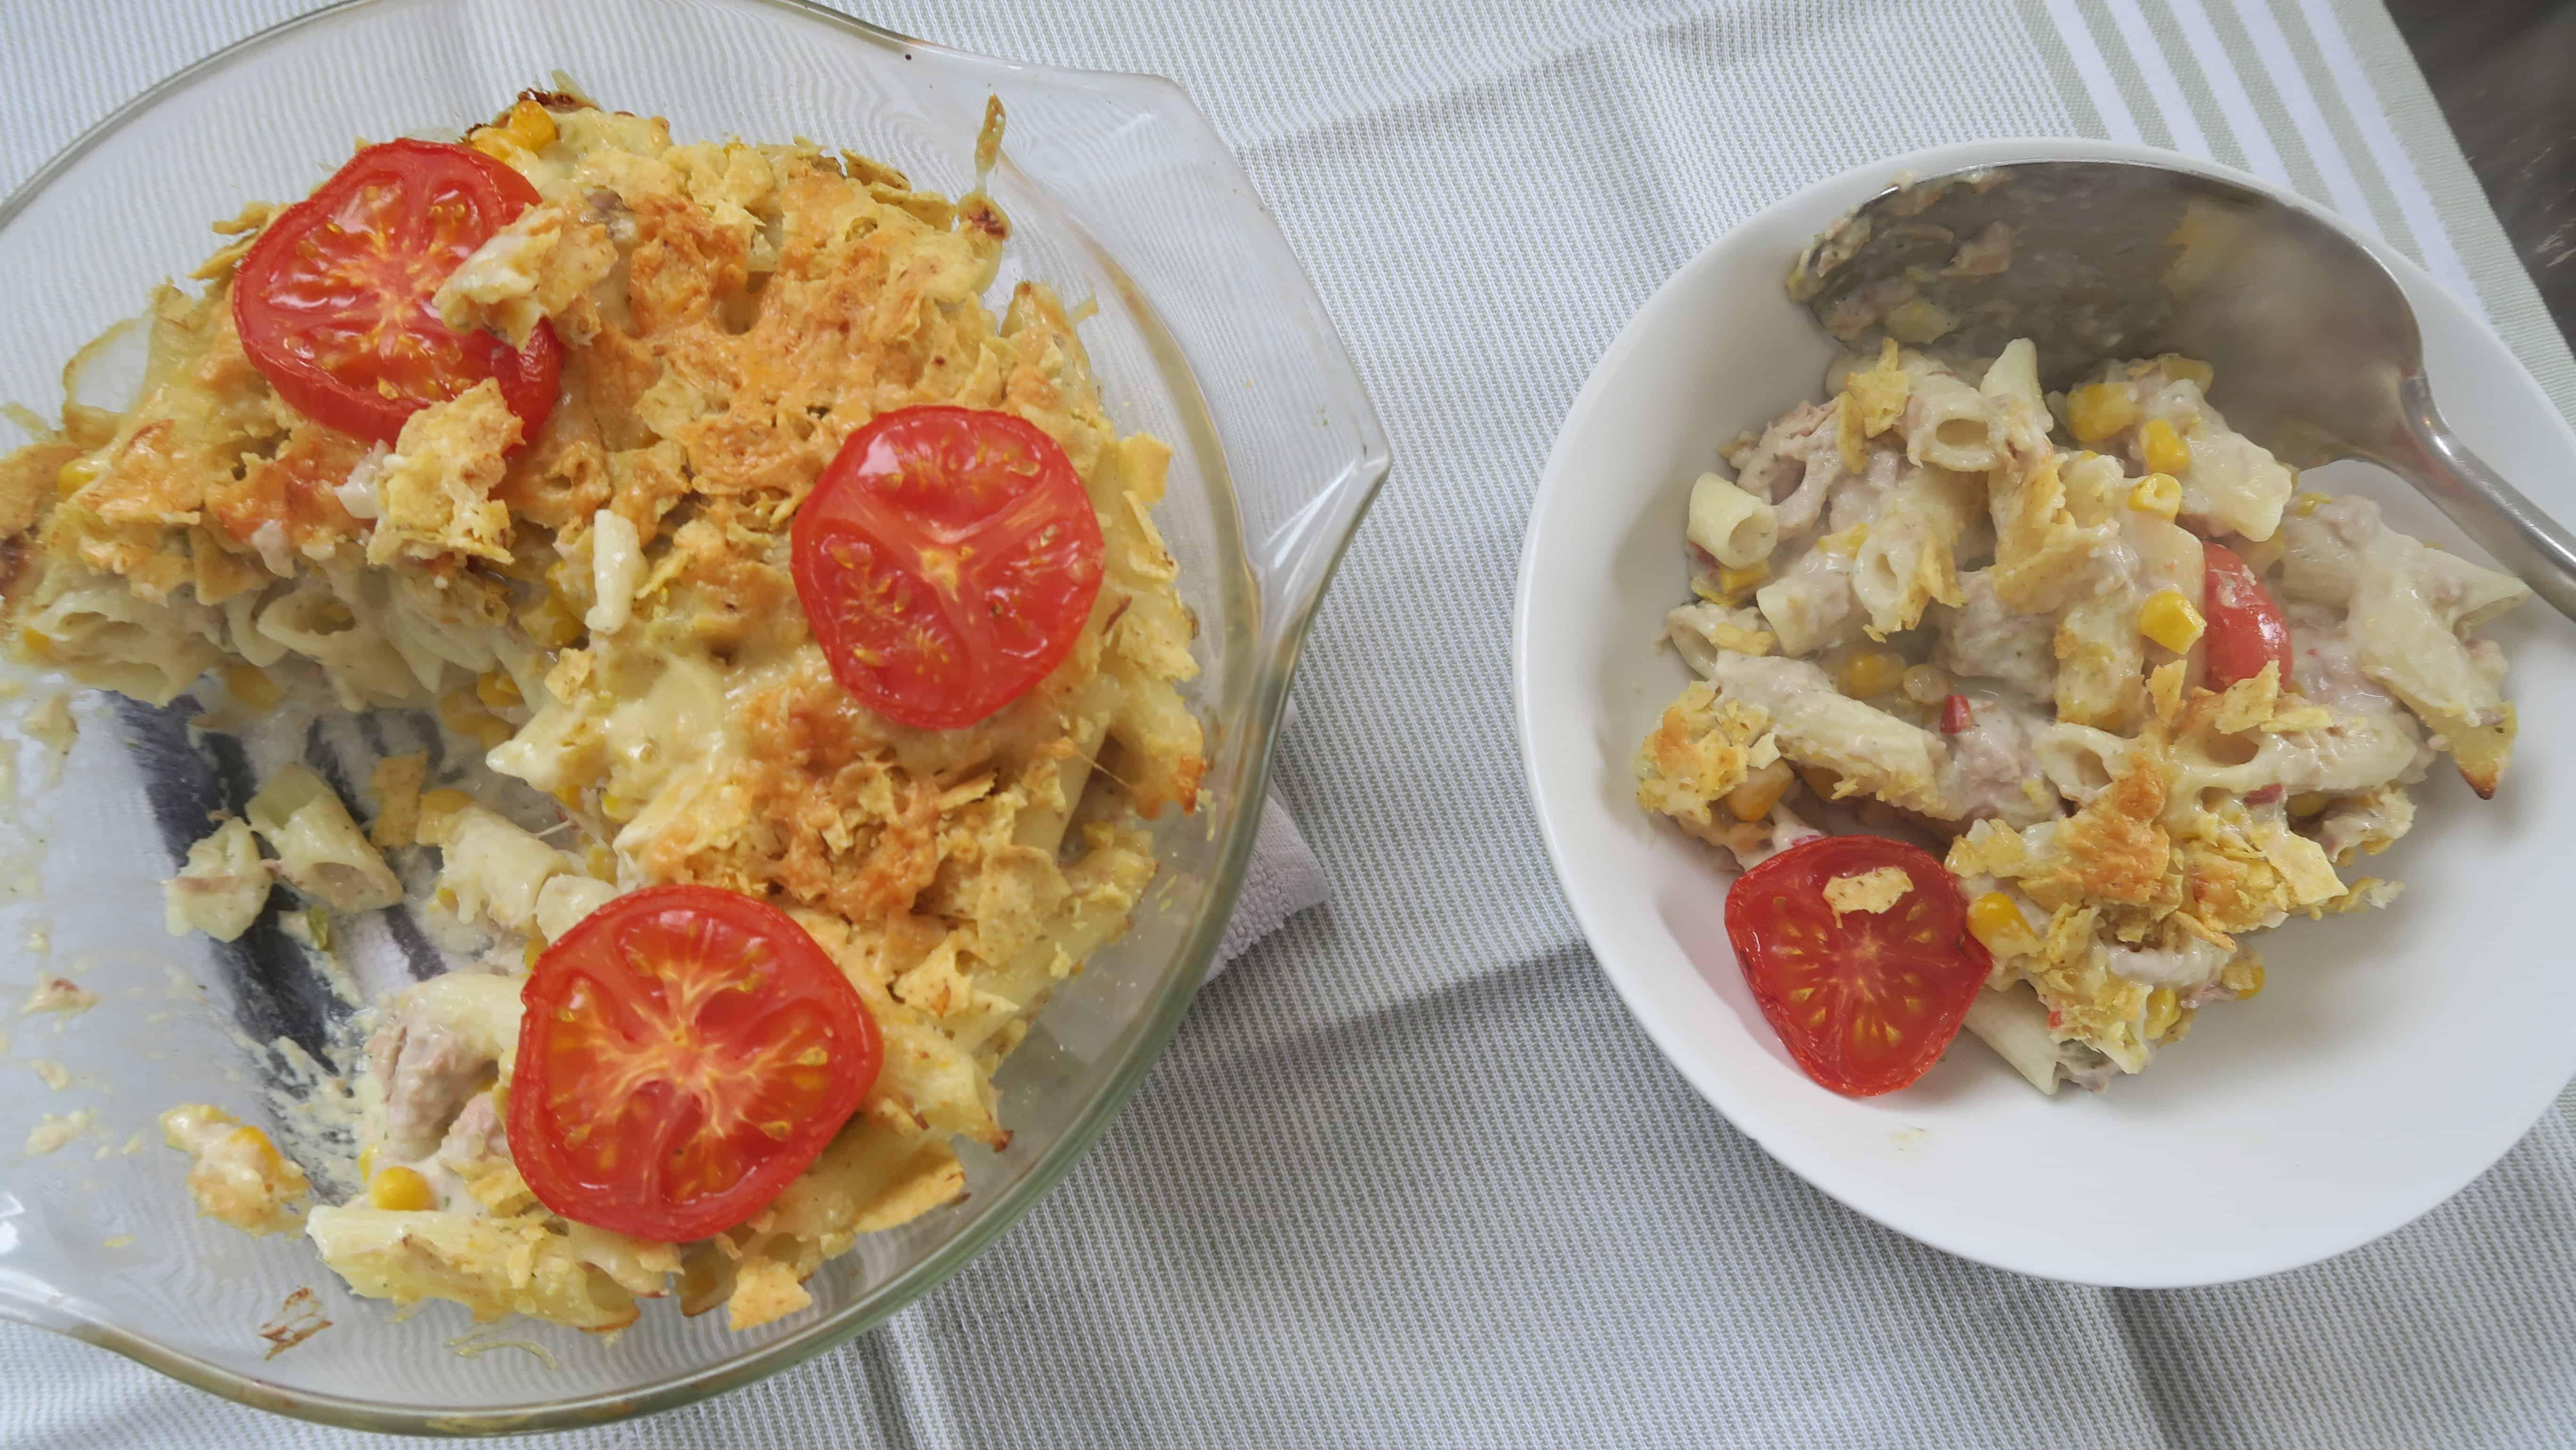 Gluten free tuna pasta bake with Thornleys Natural Foods ...